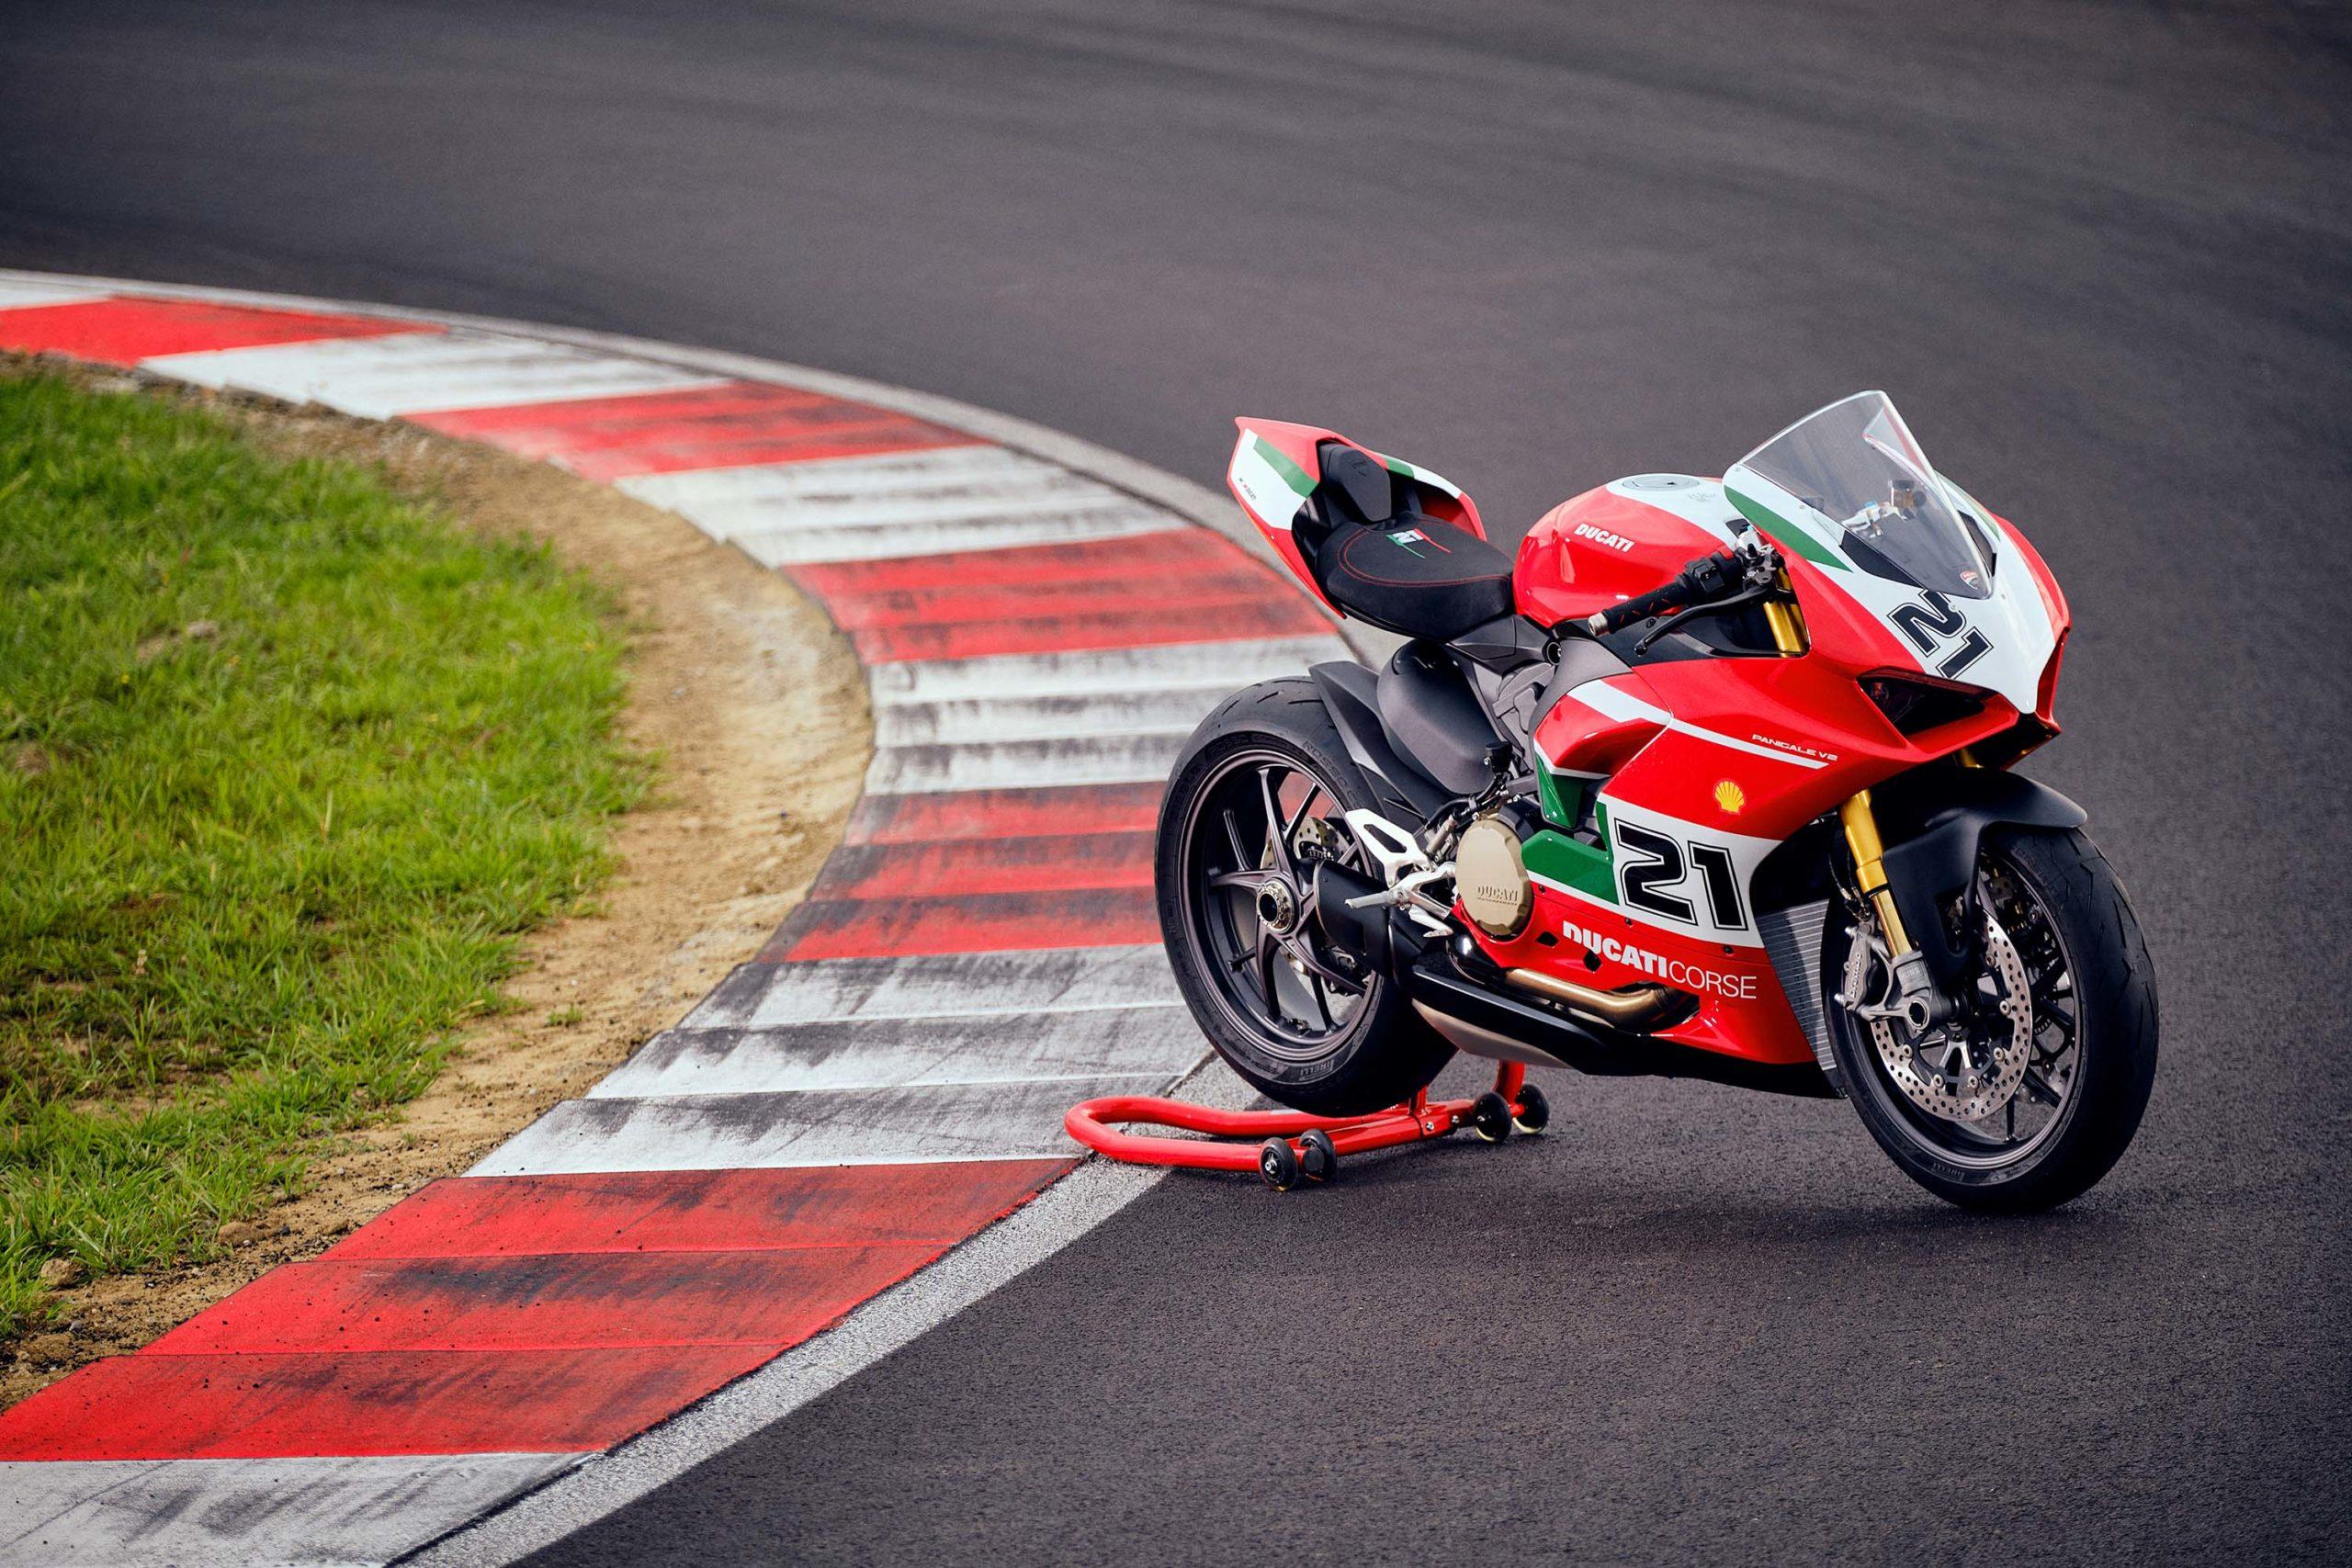 Ducati-Panigale-V4-Troy-Bayliss-57-scale